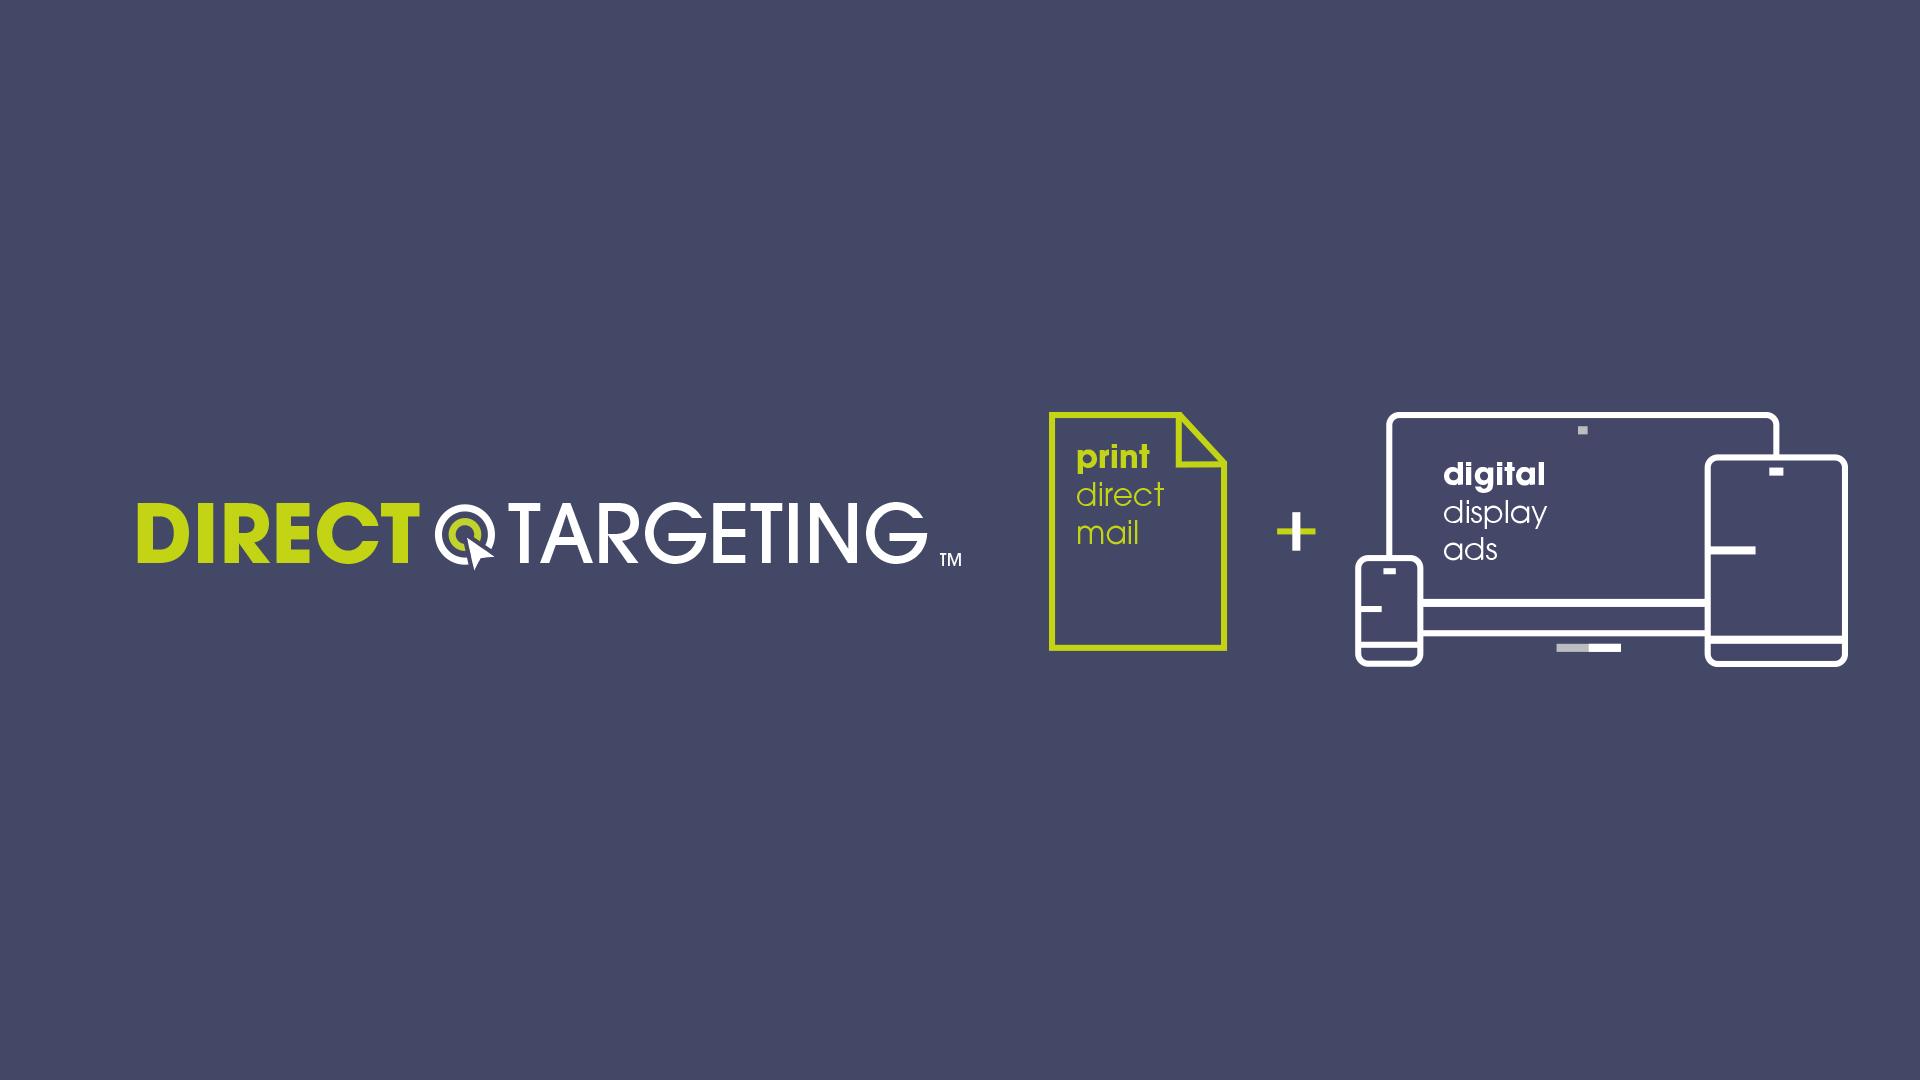 Direct_Targeting_0000_1.png